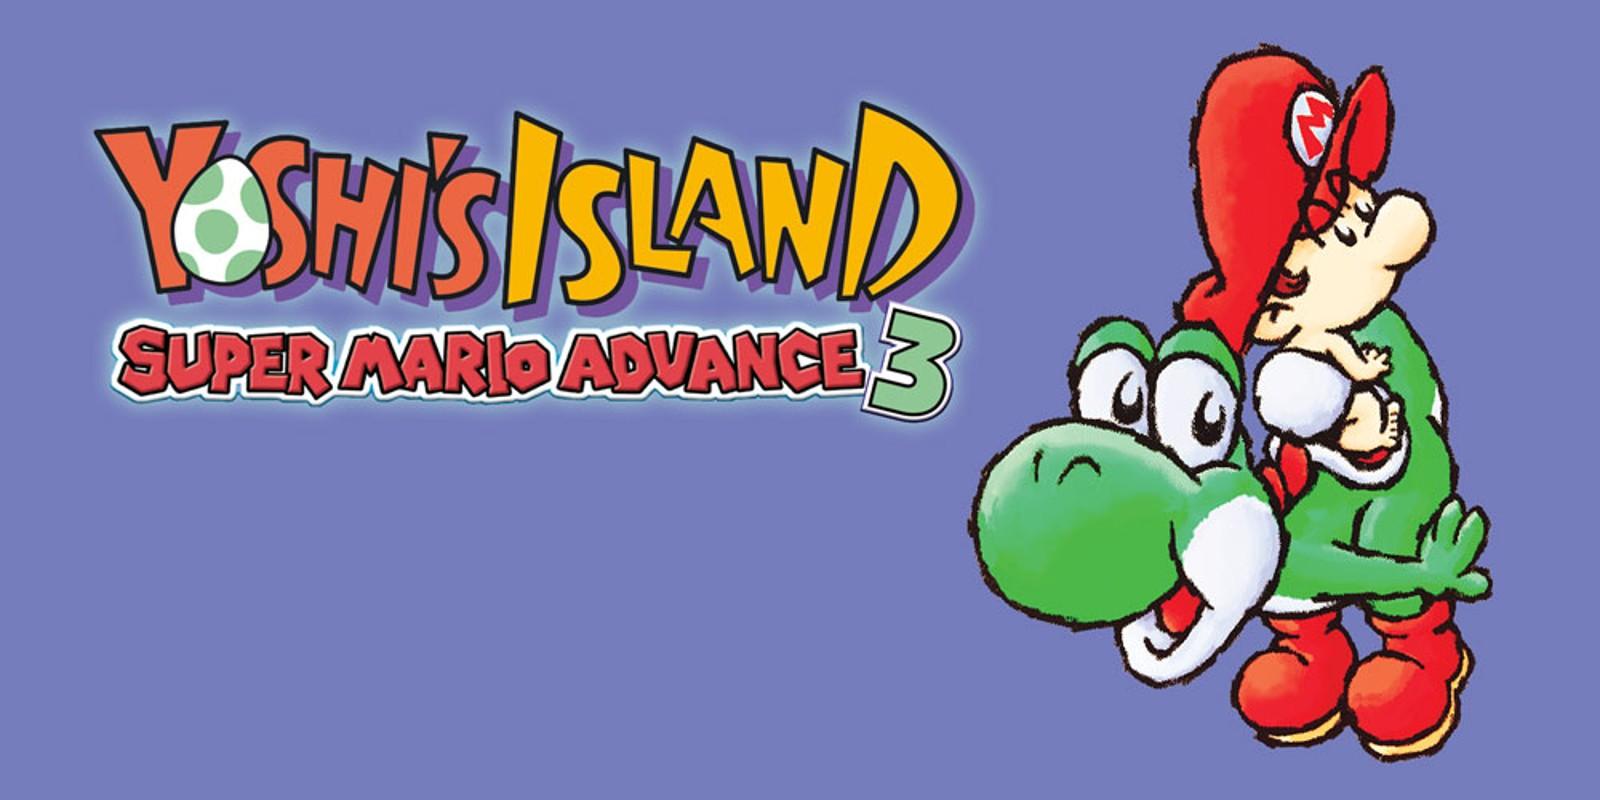 Yoshi Island Games